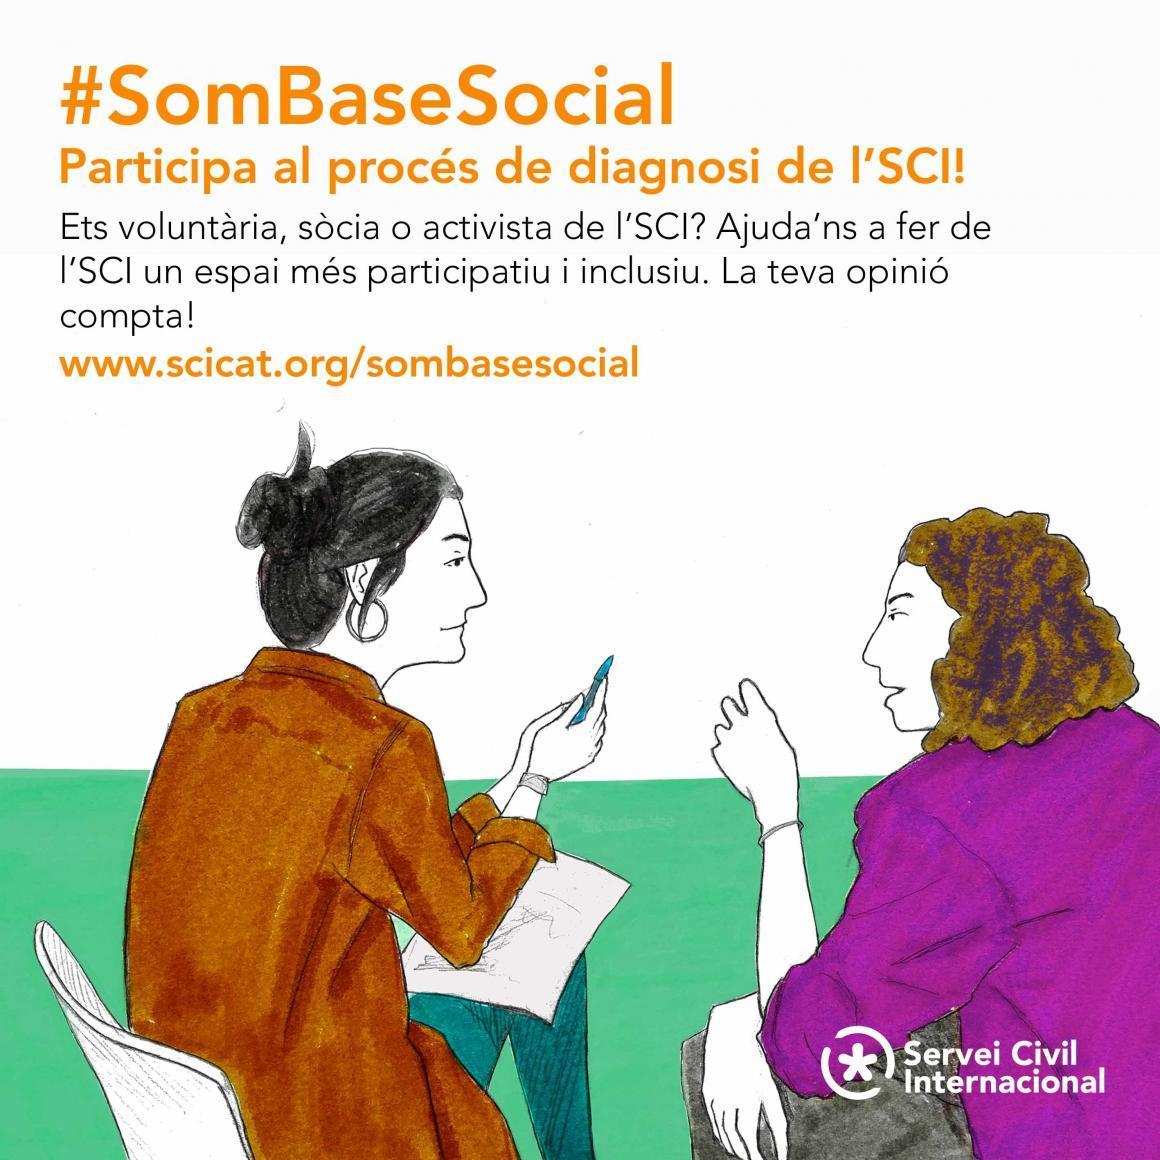 #SomBaseSocial: Participa al procés de diagnosi de l'SCI!